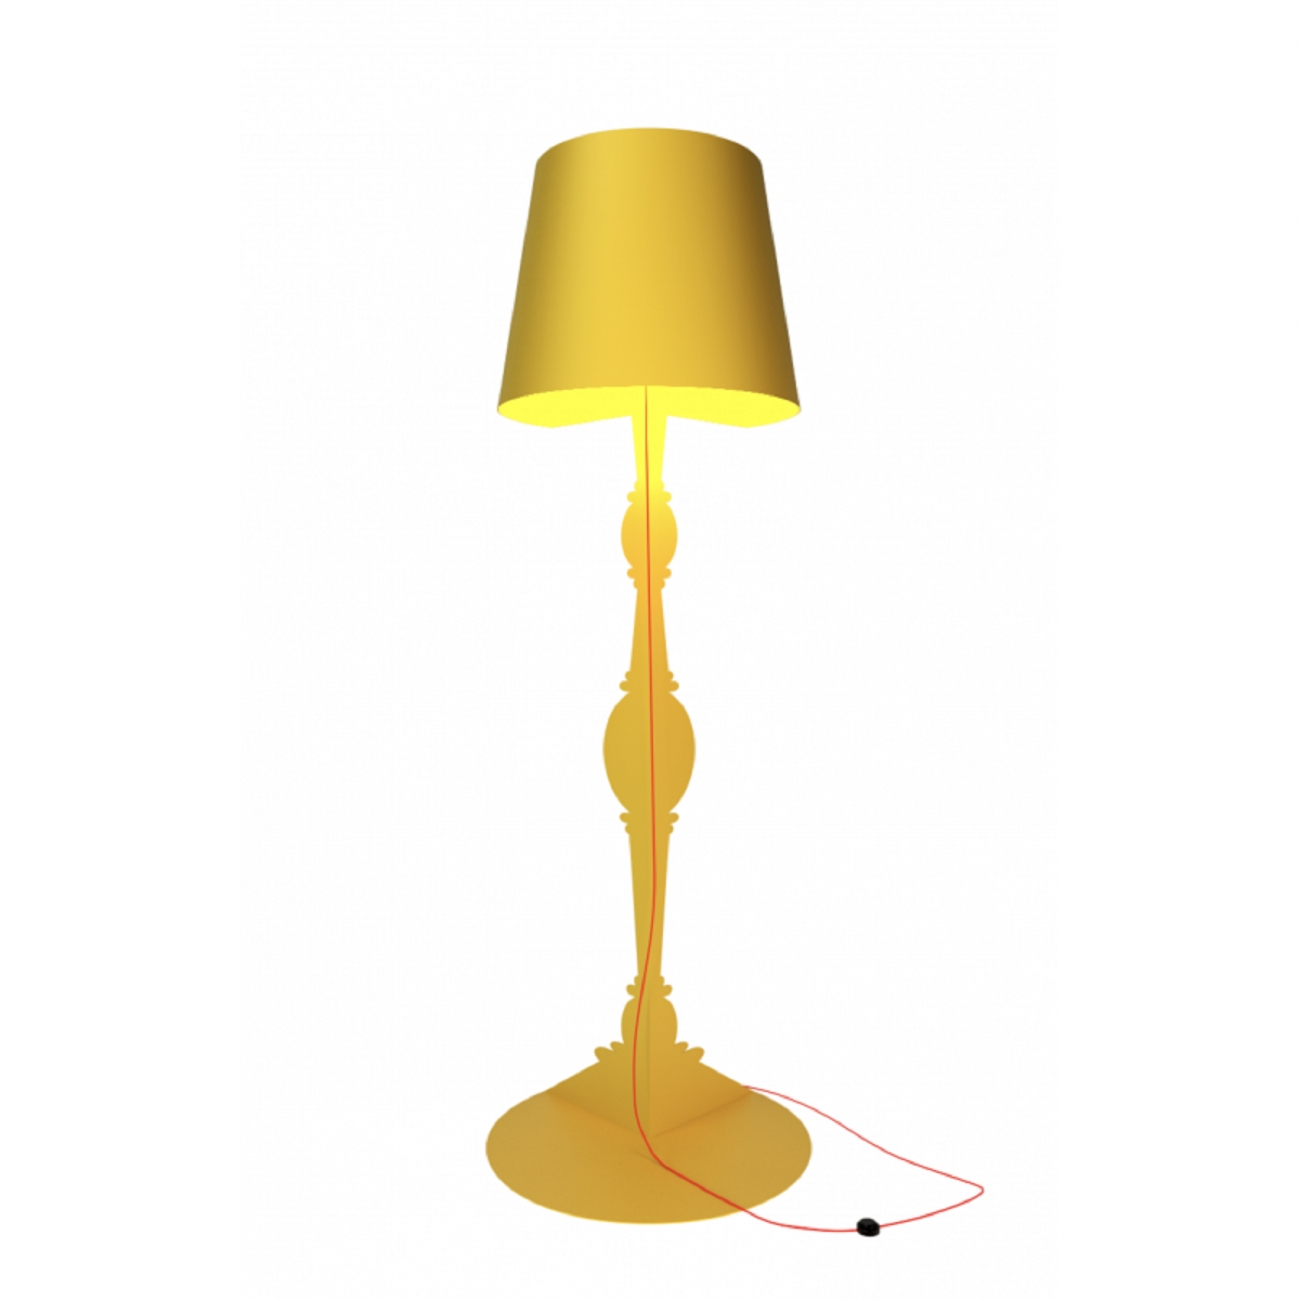 Youmeand Demi 270 Floor Lamp